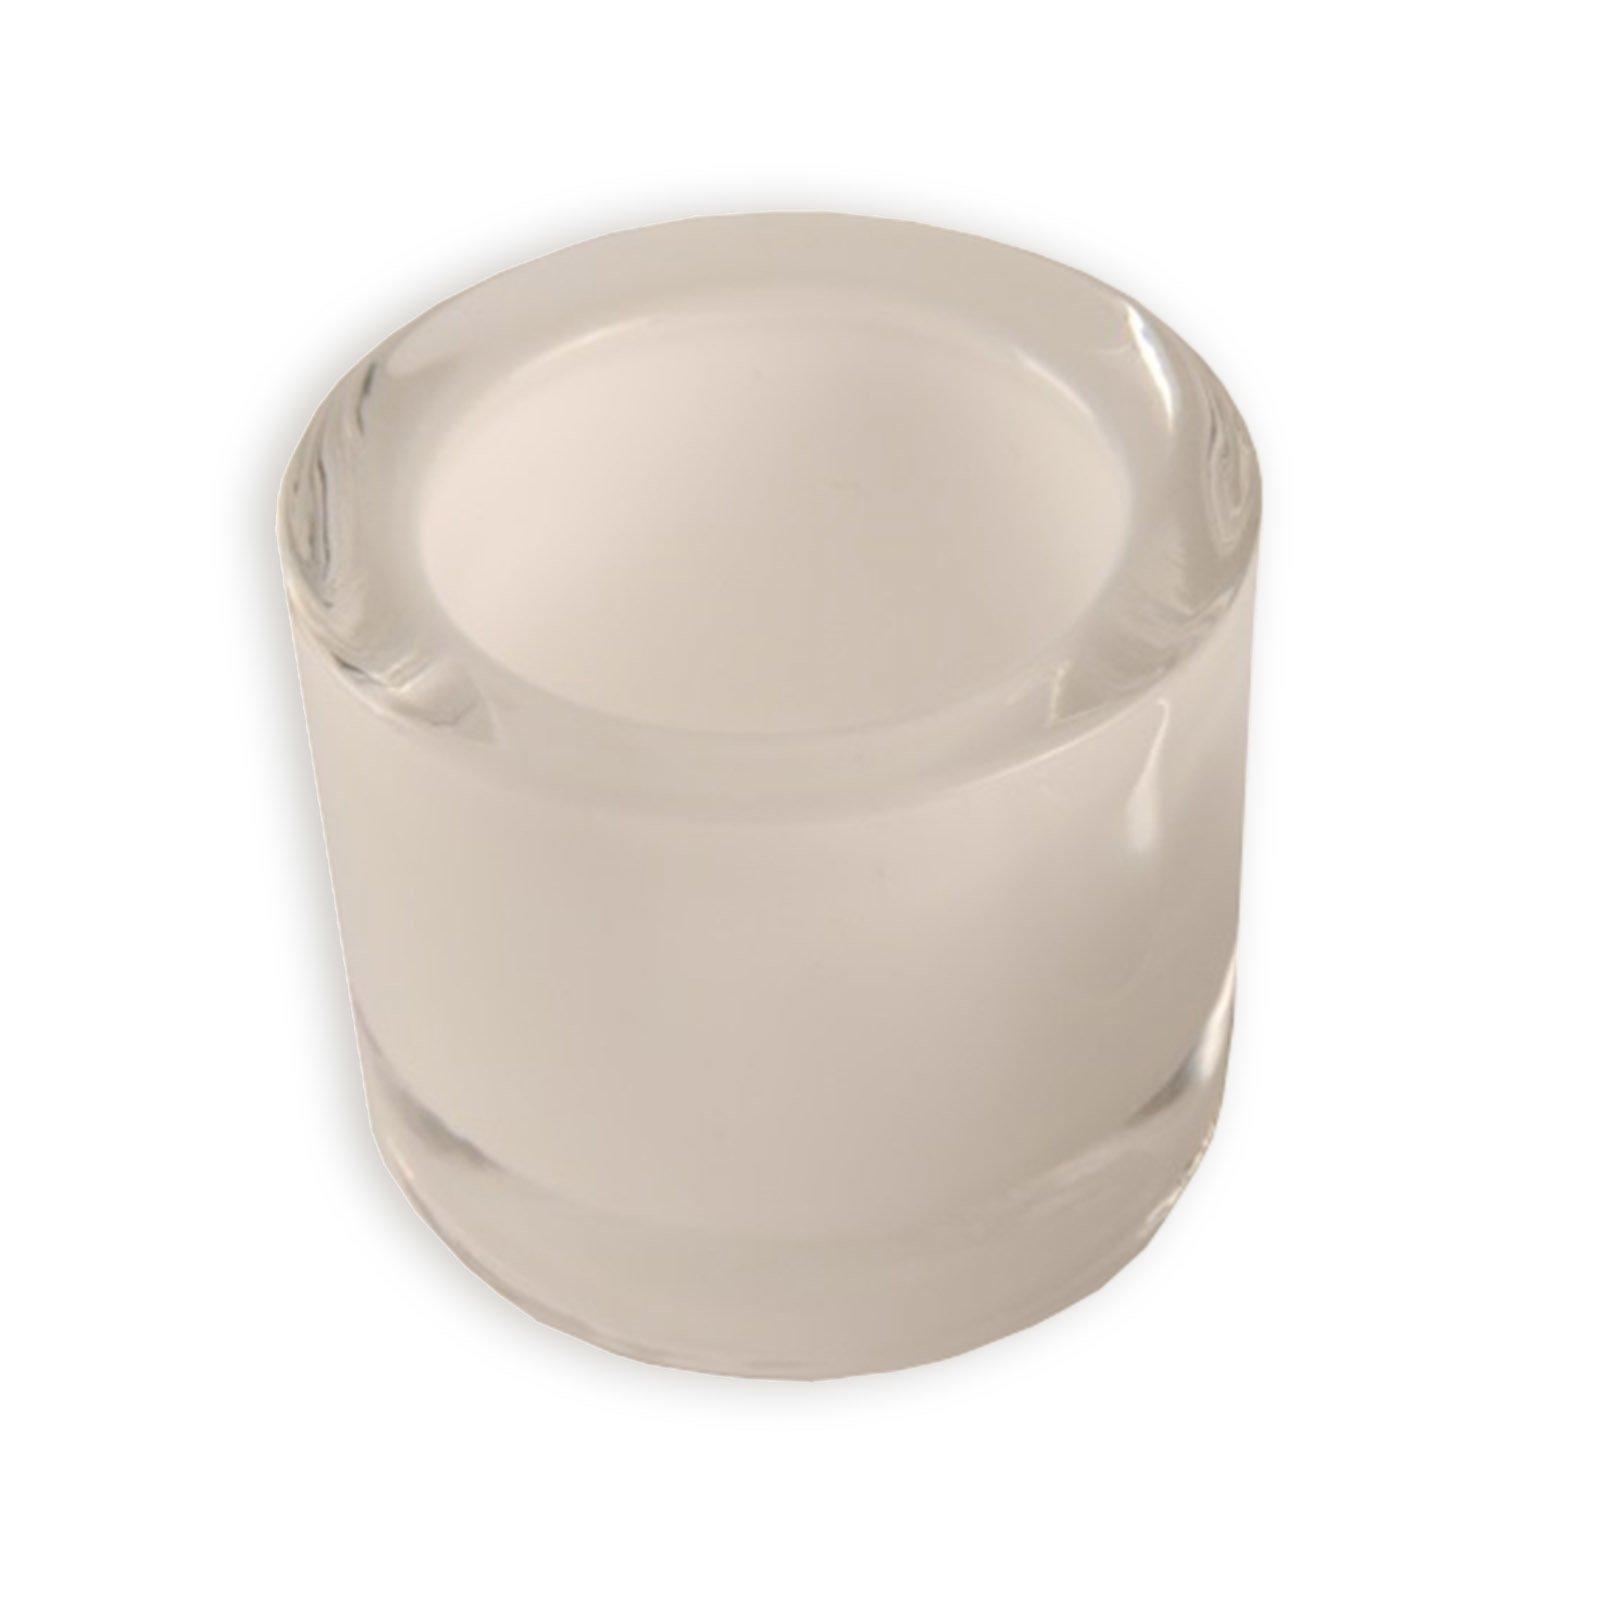 glas windlicht wei 6 5 5 7 cm hoch kerzen kerzenhalter deko wohnaccessoires. Black Bedroom Furniture Sets. Home Design Ideas